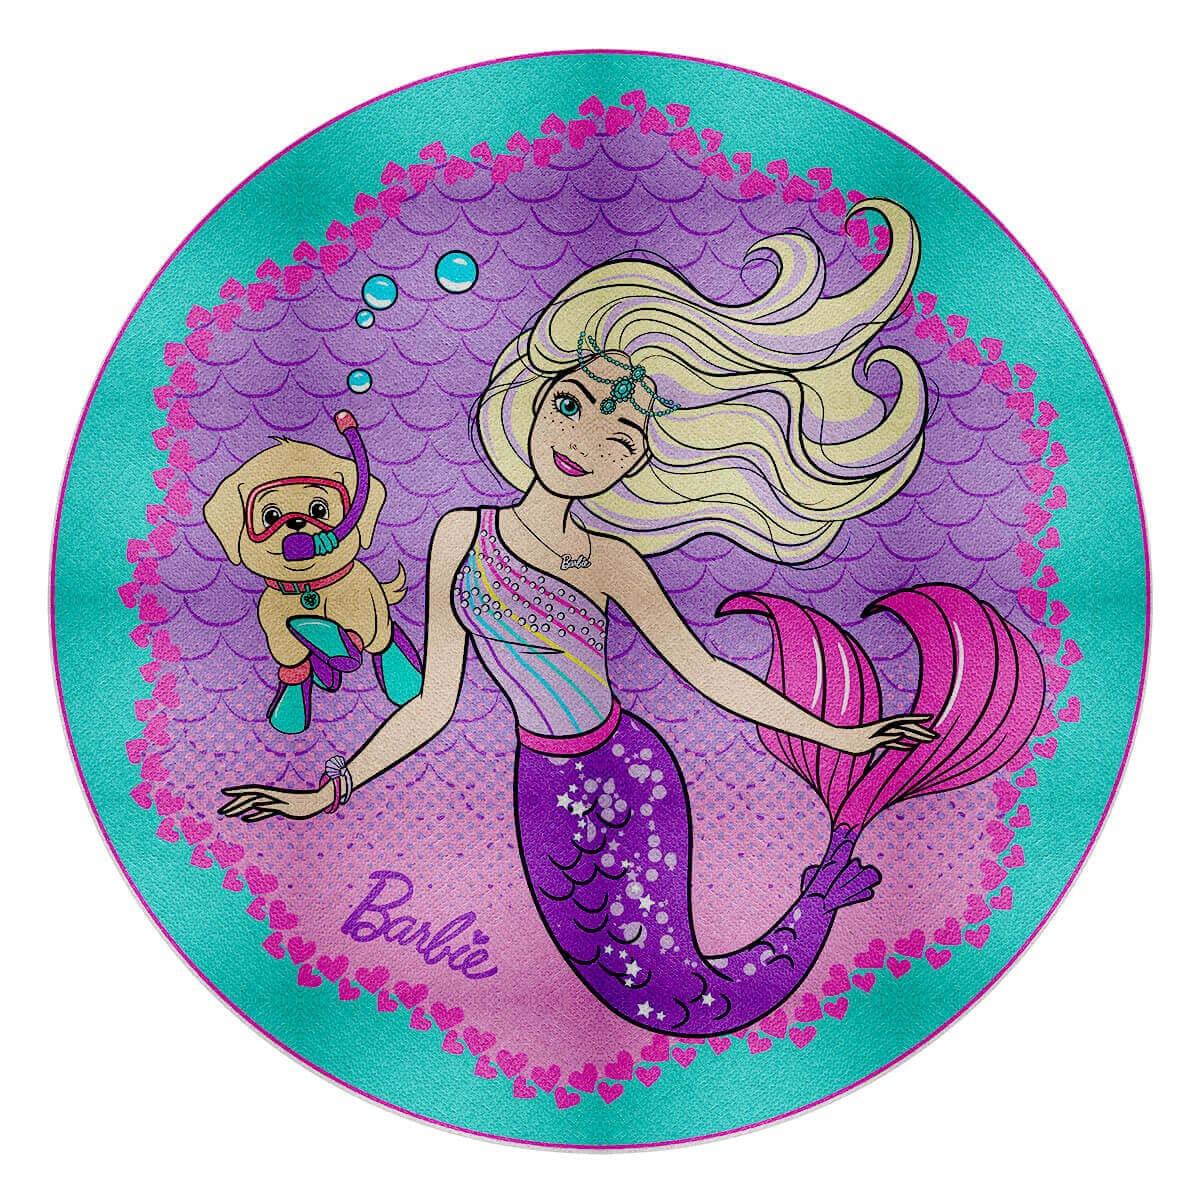 Toalha de Praia Infantil Aveludada Redonda Barbie Pet